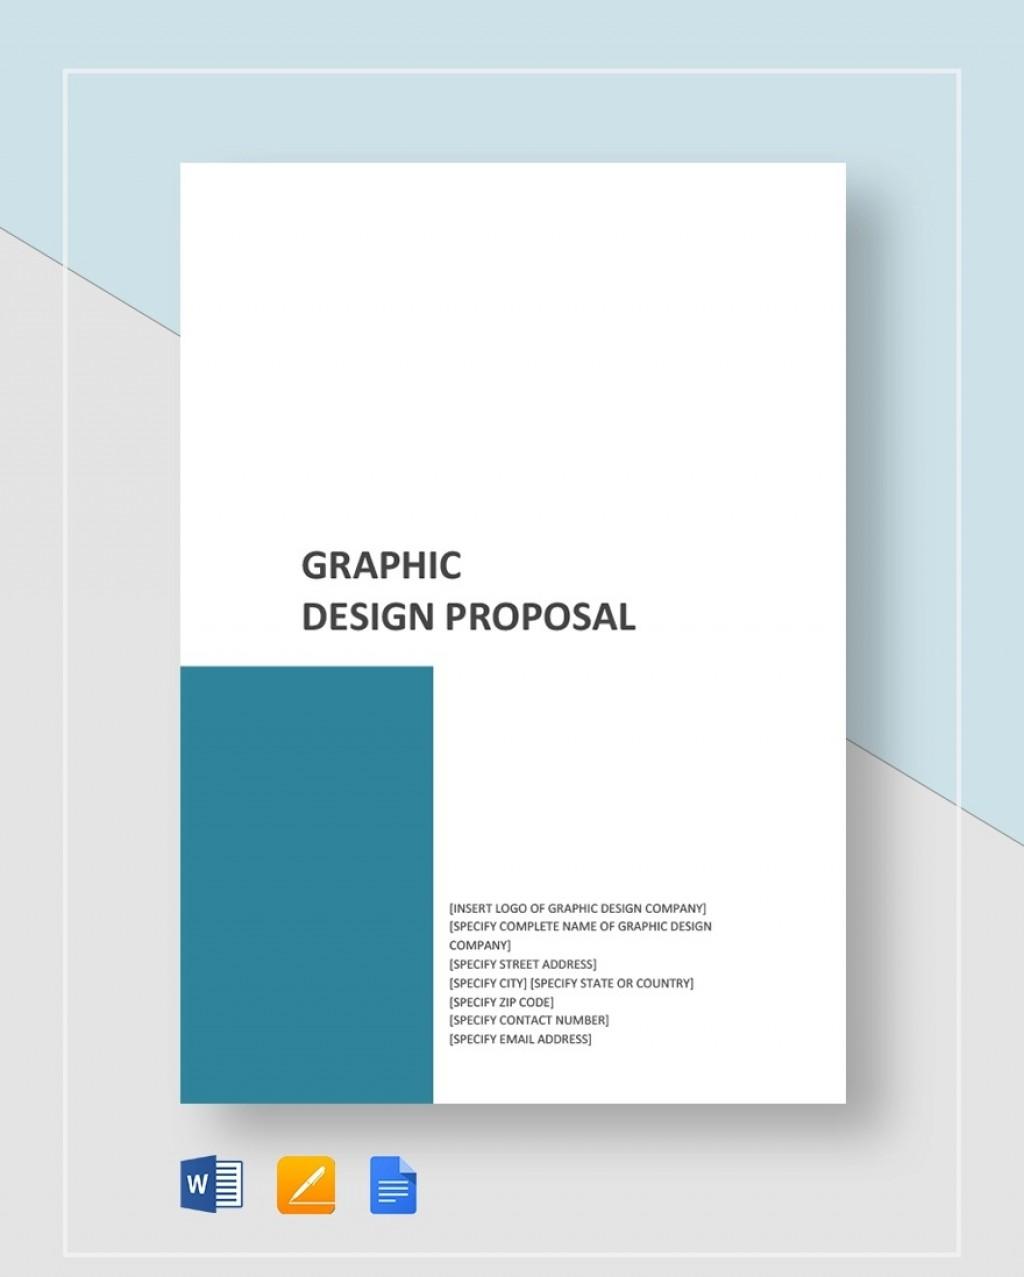 Template Graphic Design Proposal Idea  Sample Pdf Doc WordLarge